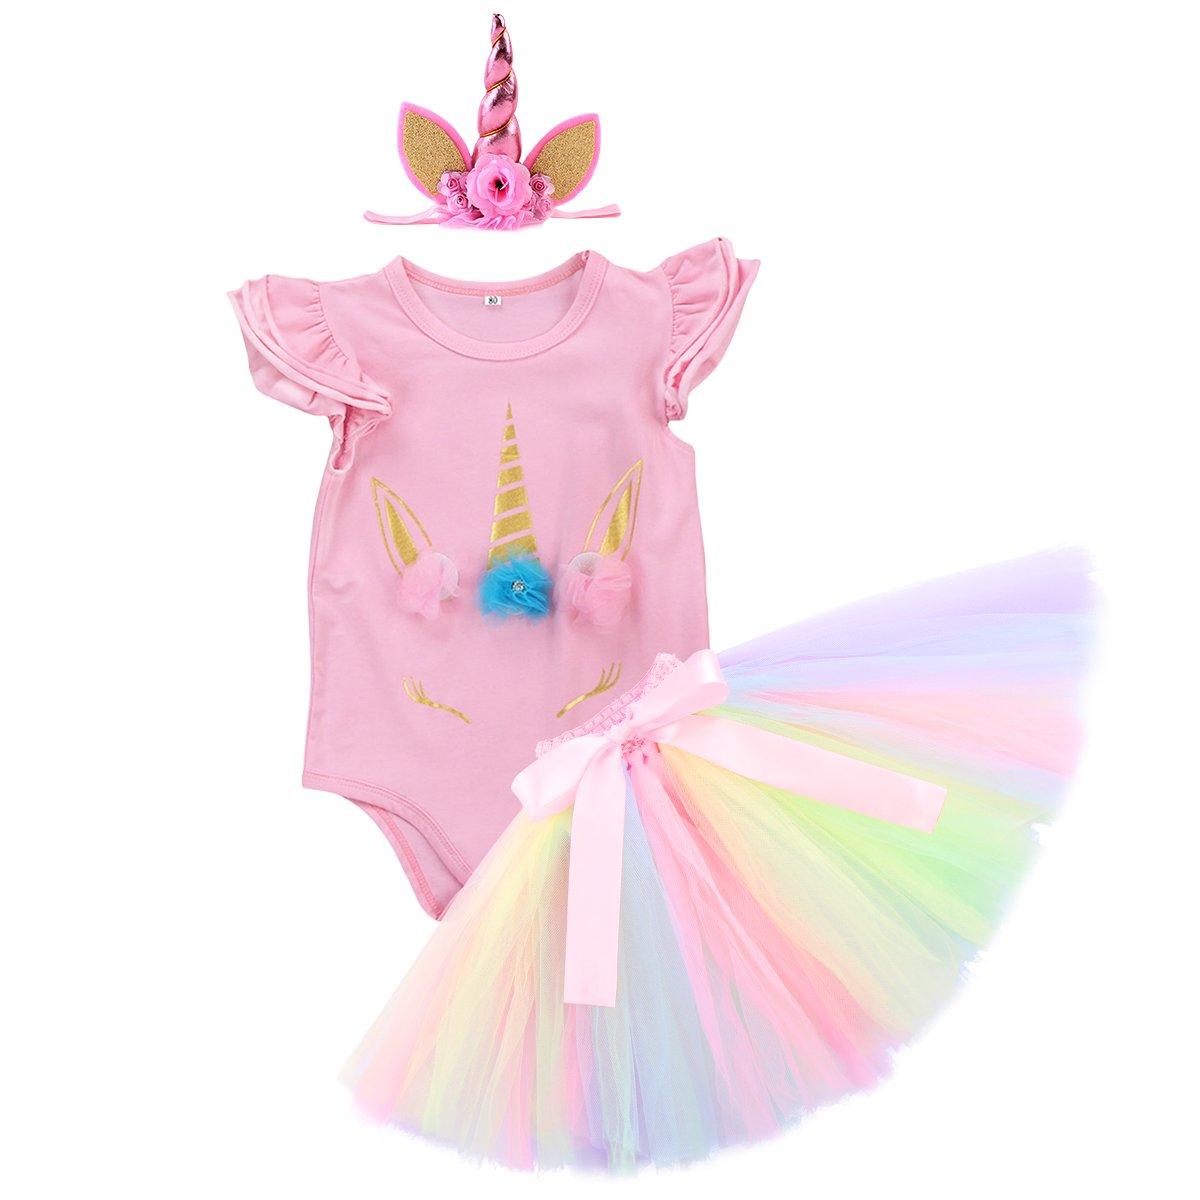 Iwemek Baby Girls 1st 2nd Birthday Cake Smash Photo Shoot 3pcs Dress Tutu Flower Pink 0 2th Outfits Newborn Infant Princess Halloween